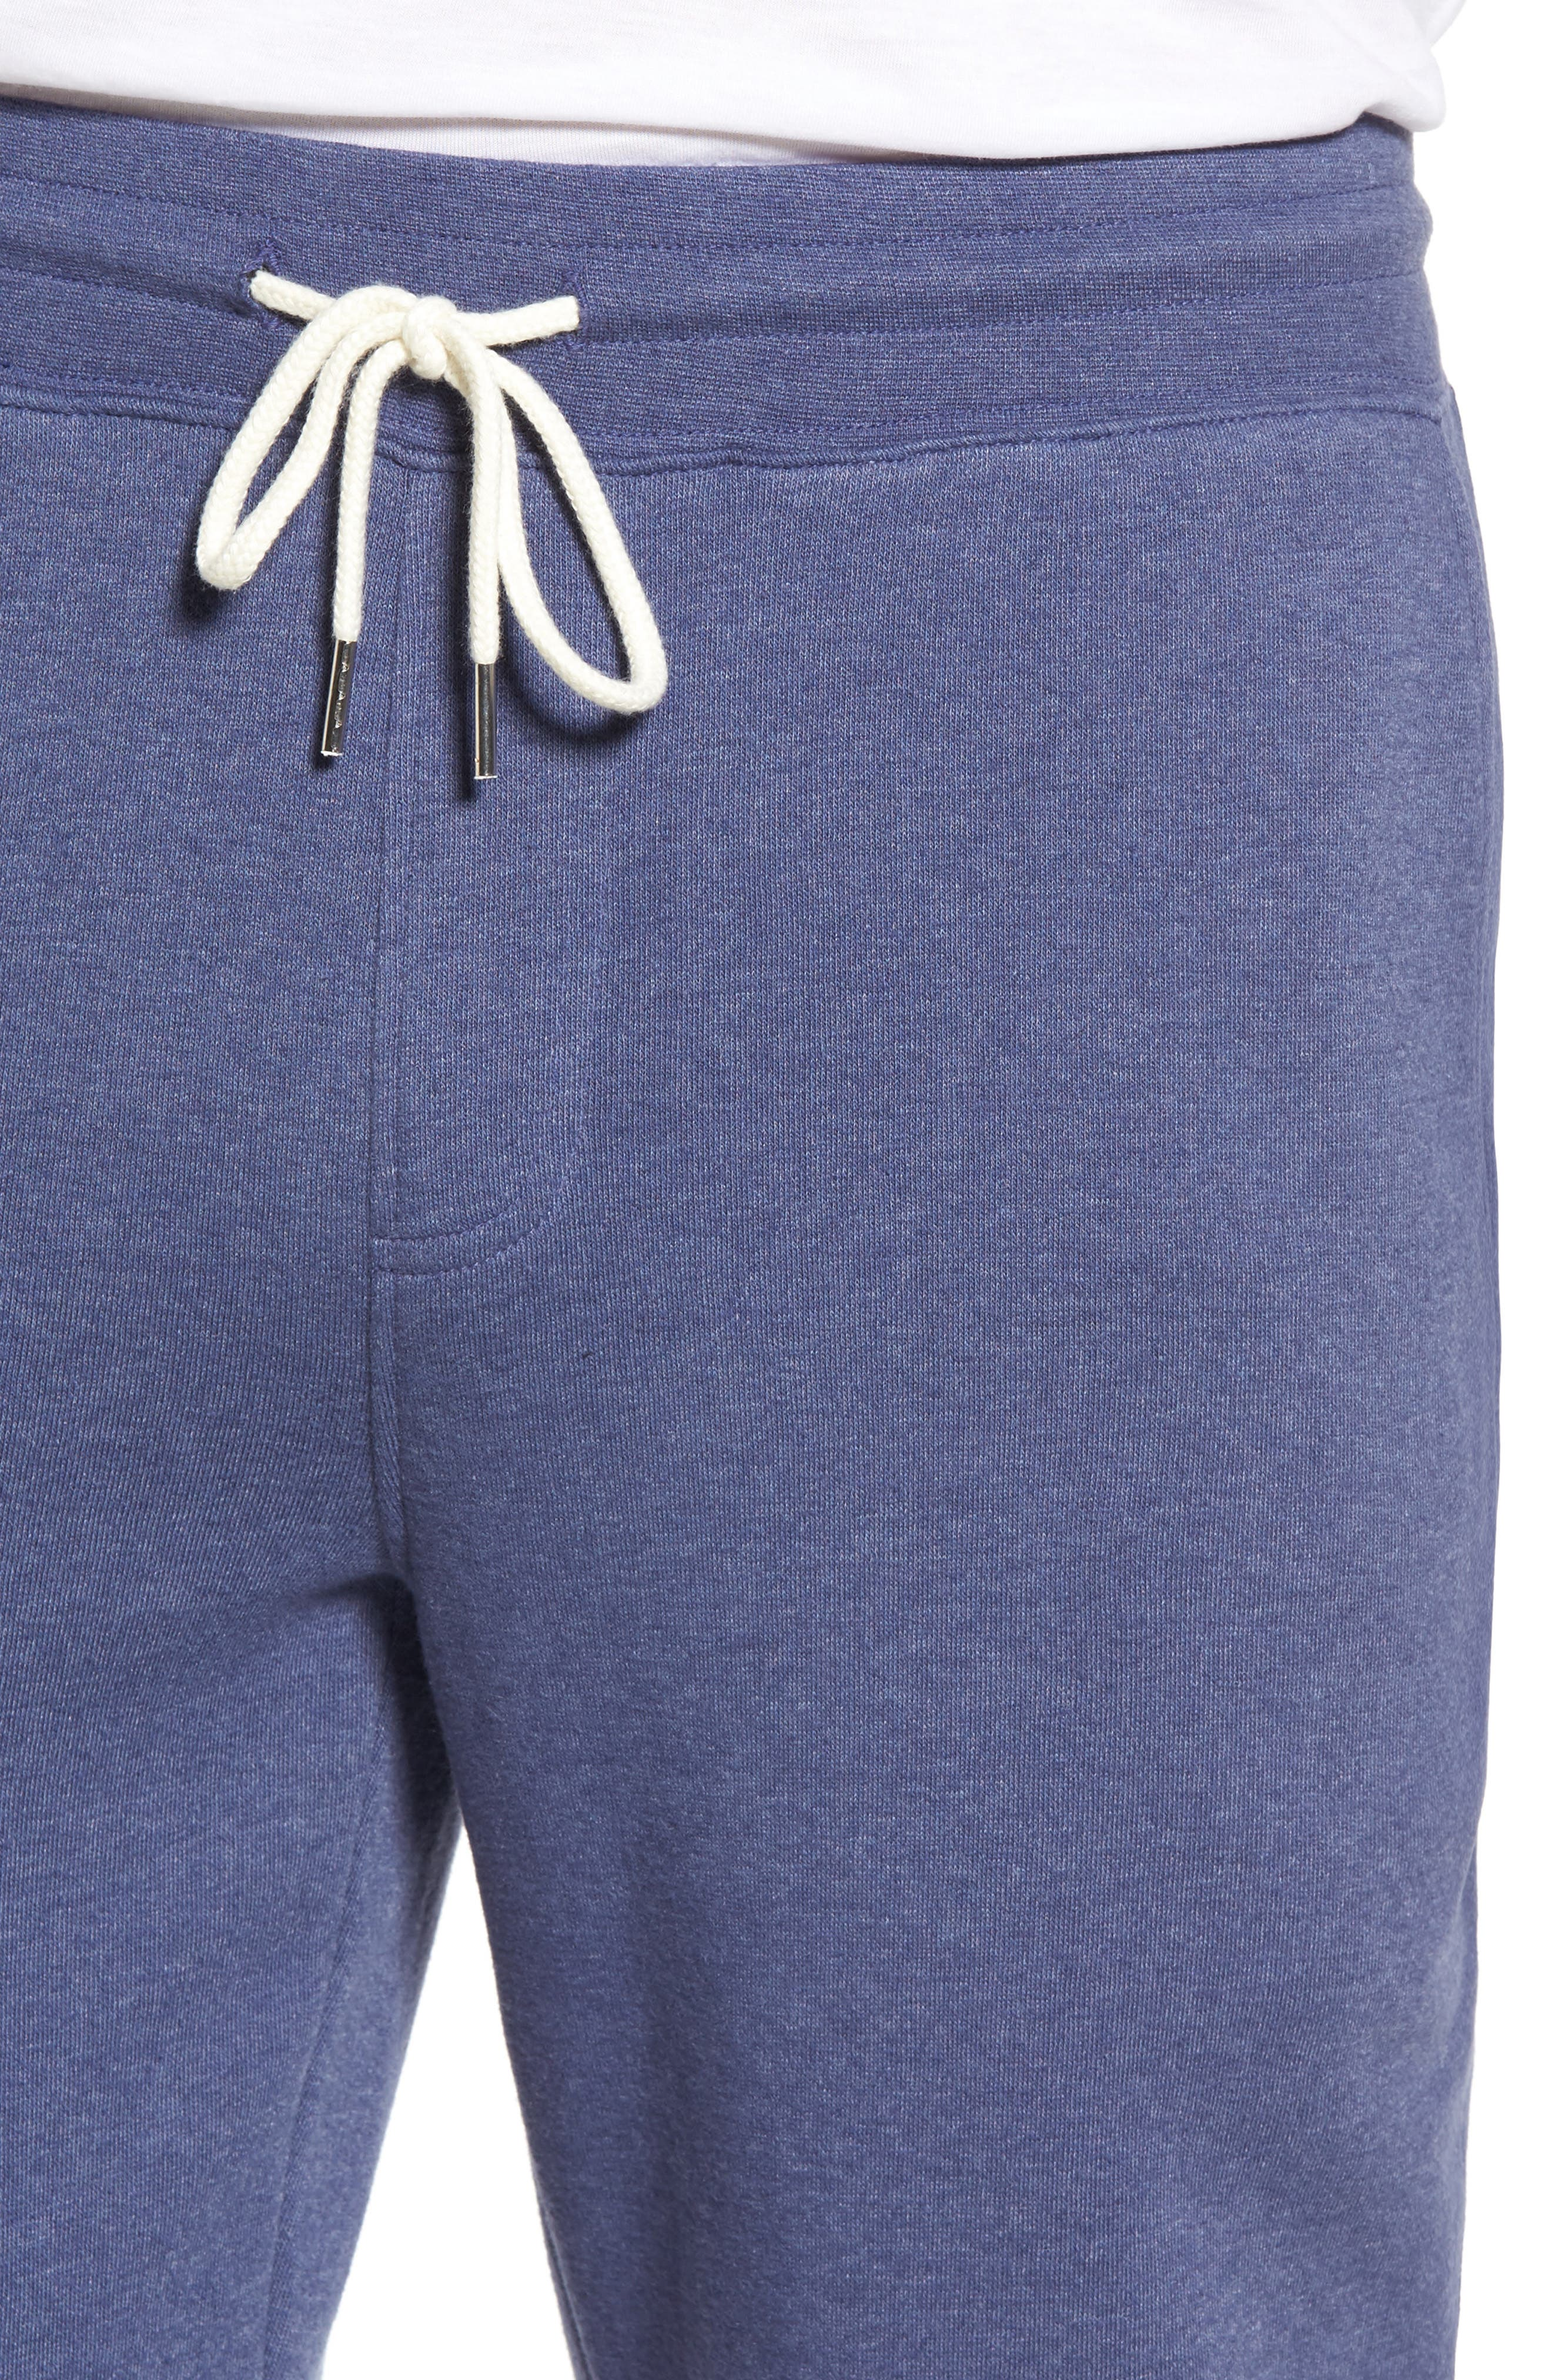 Jogger Pants,                             Alternate thumbnail 4, color,                             Navy Crown